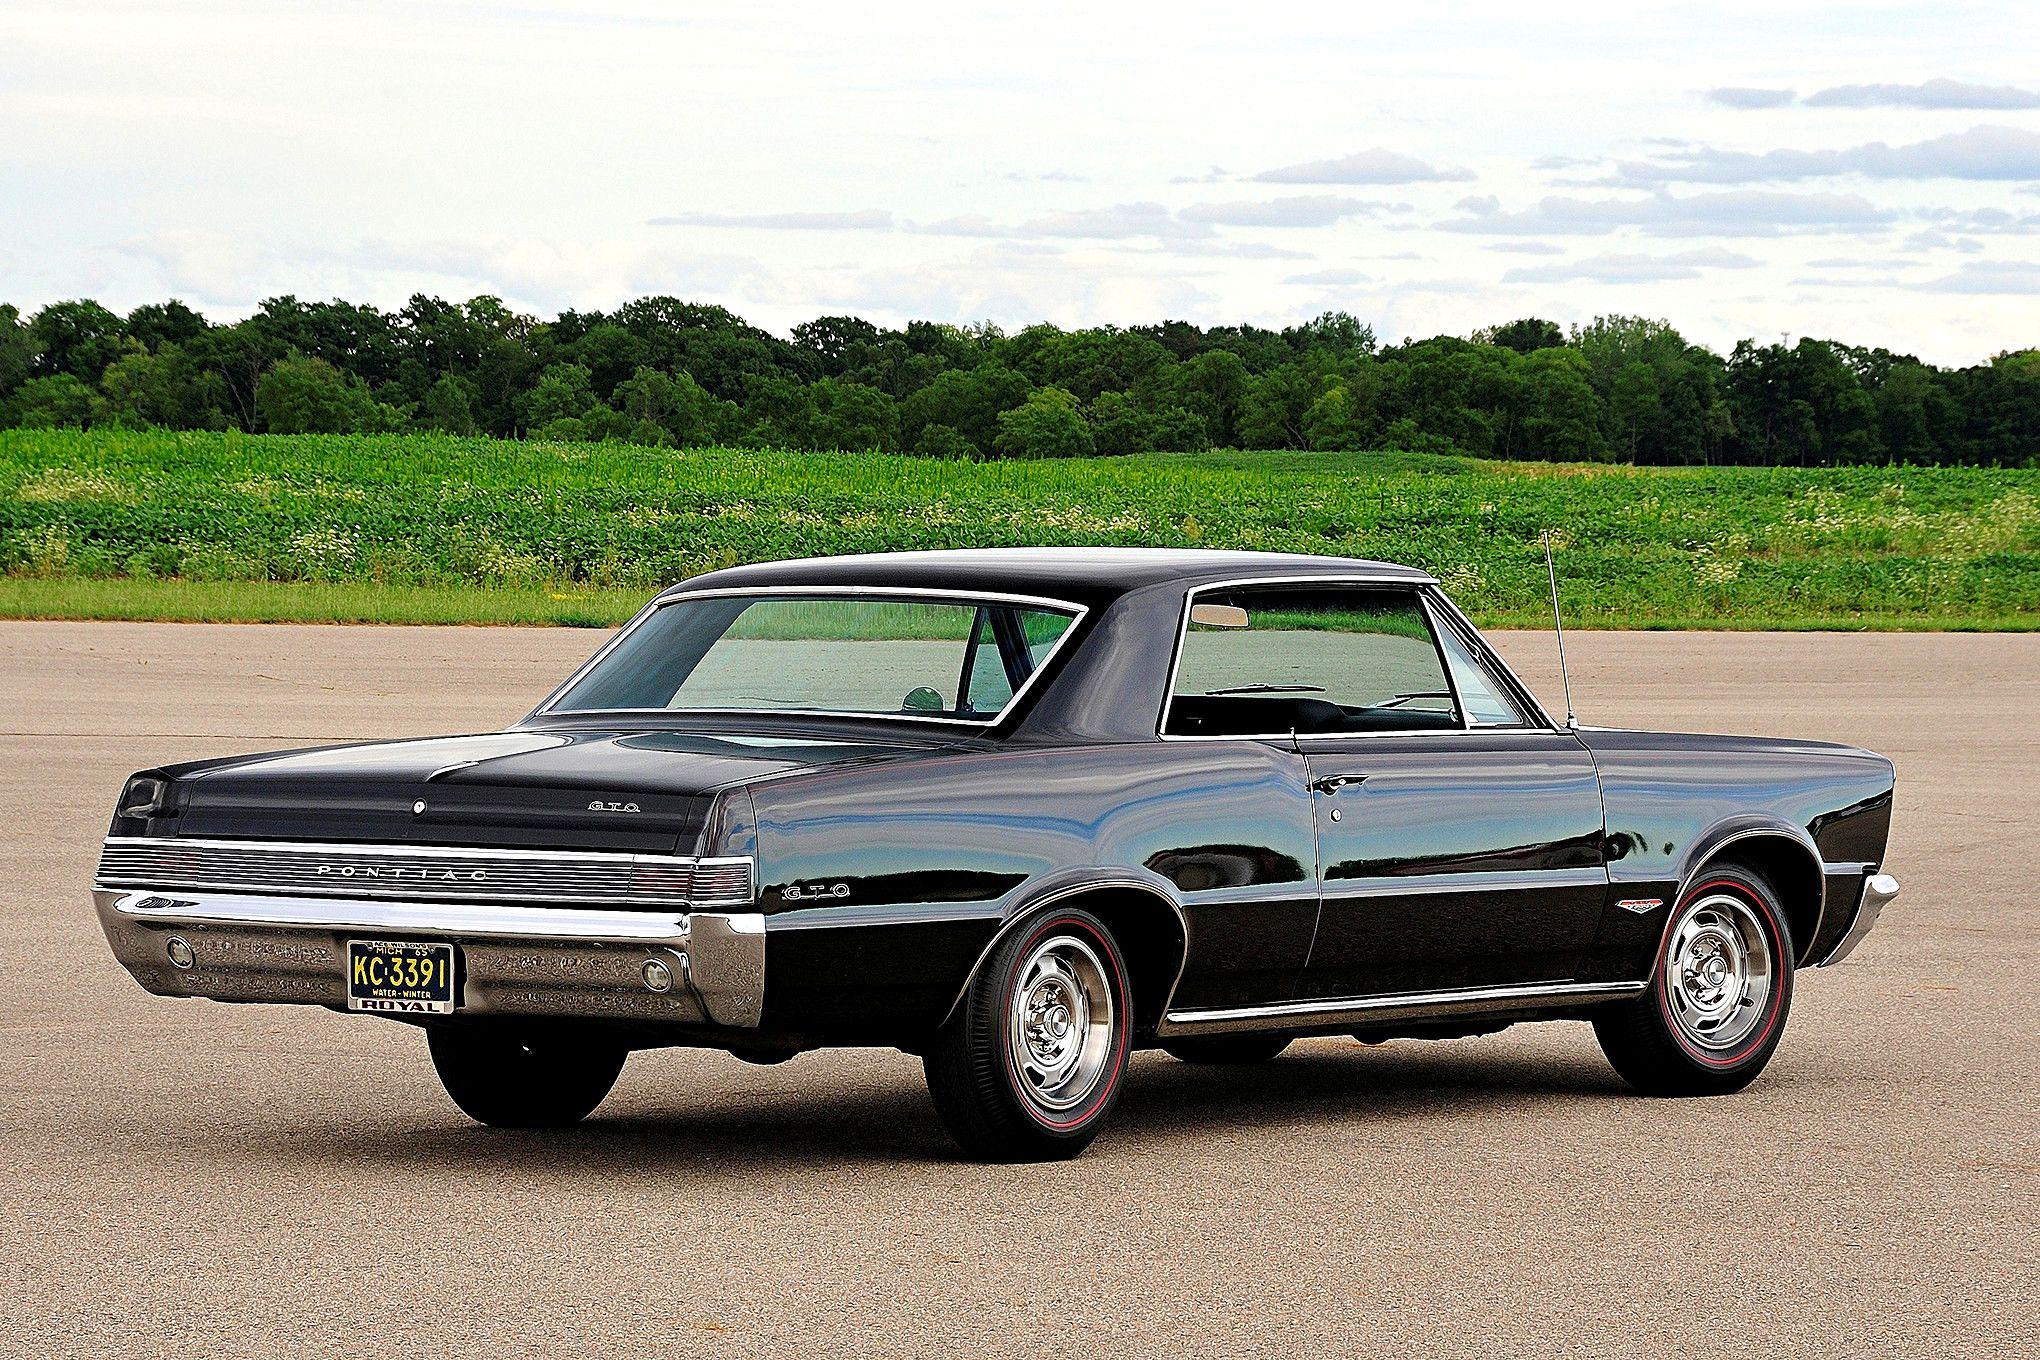 1965 gto | 5,000-Mile Unrestored 1965 Pontiac GTO Was a Dragstrip ...